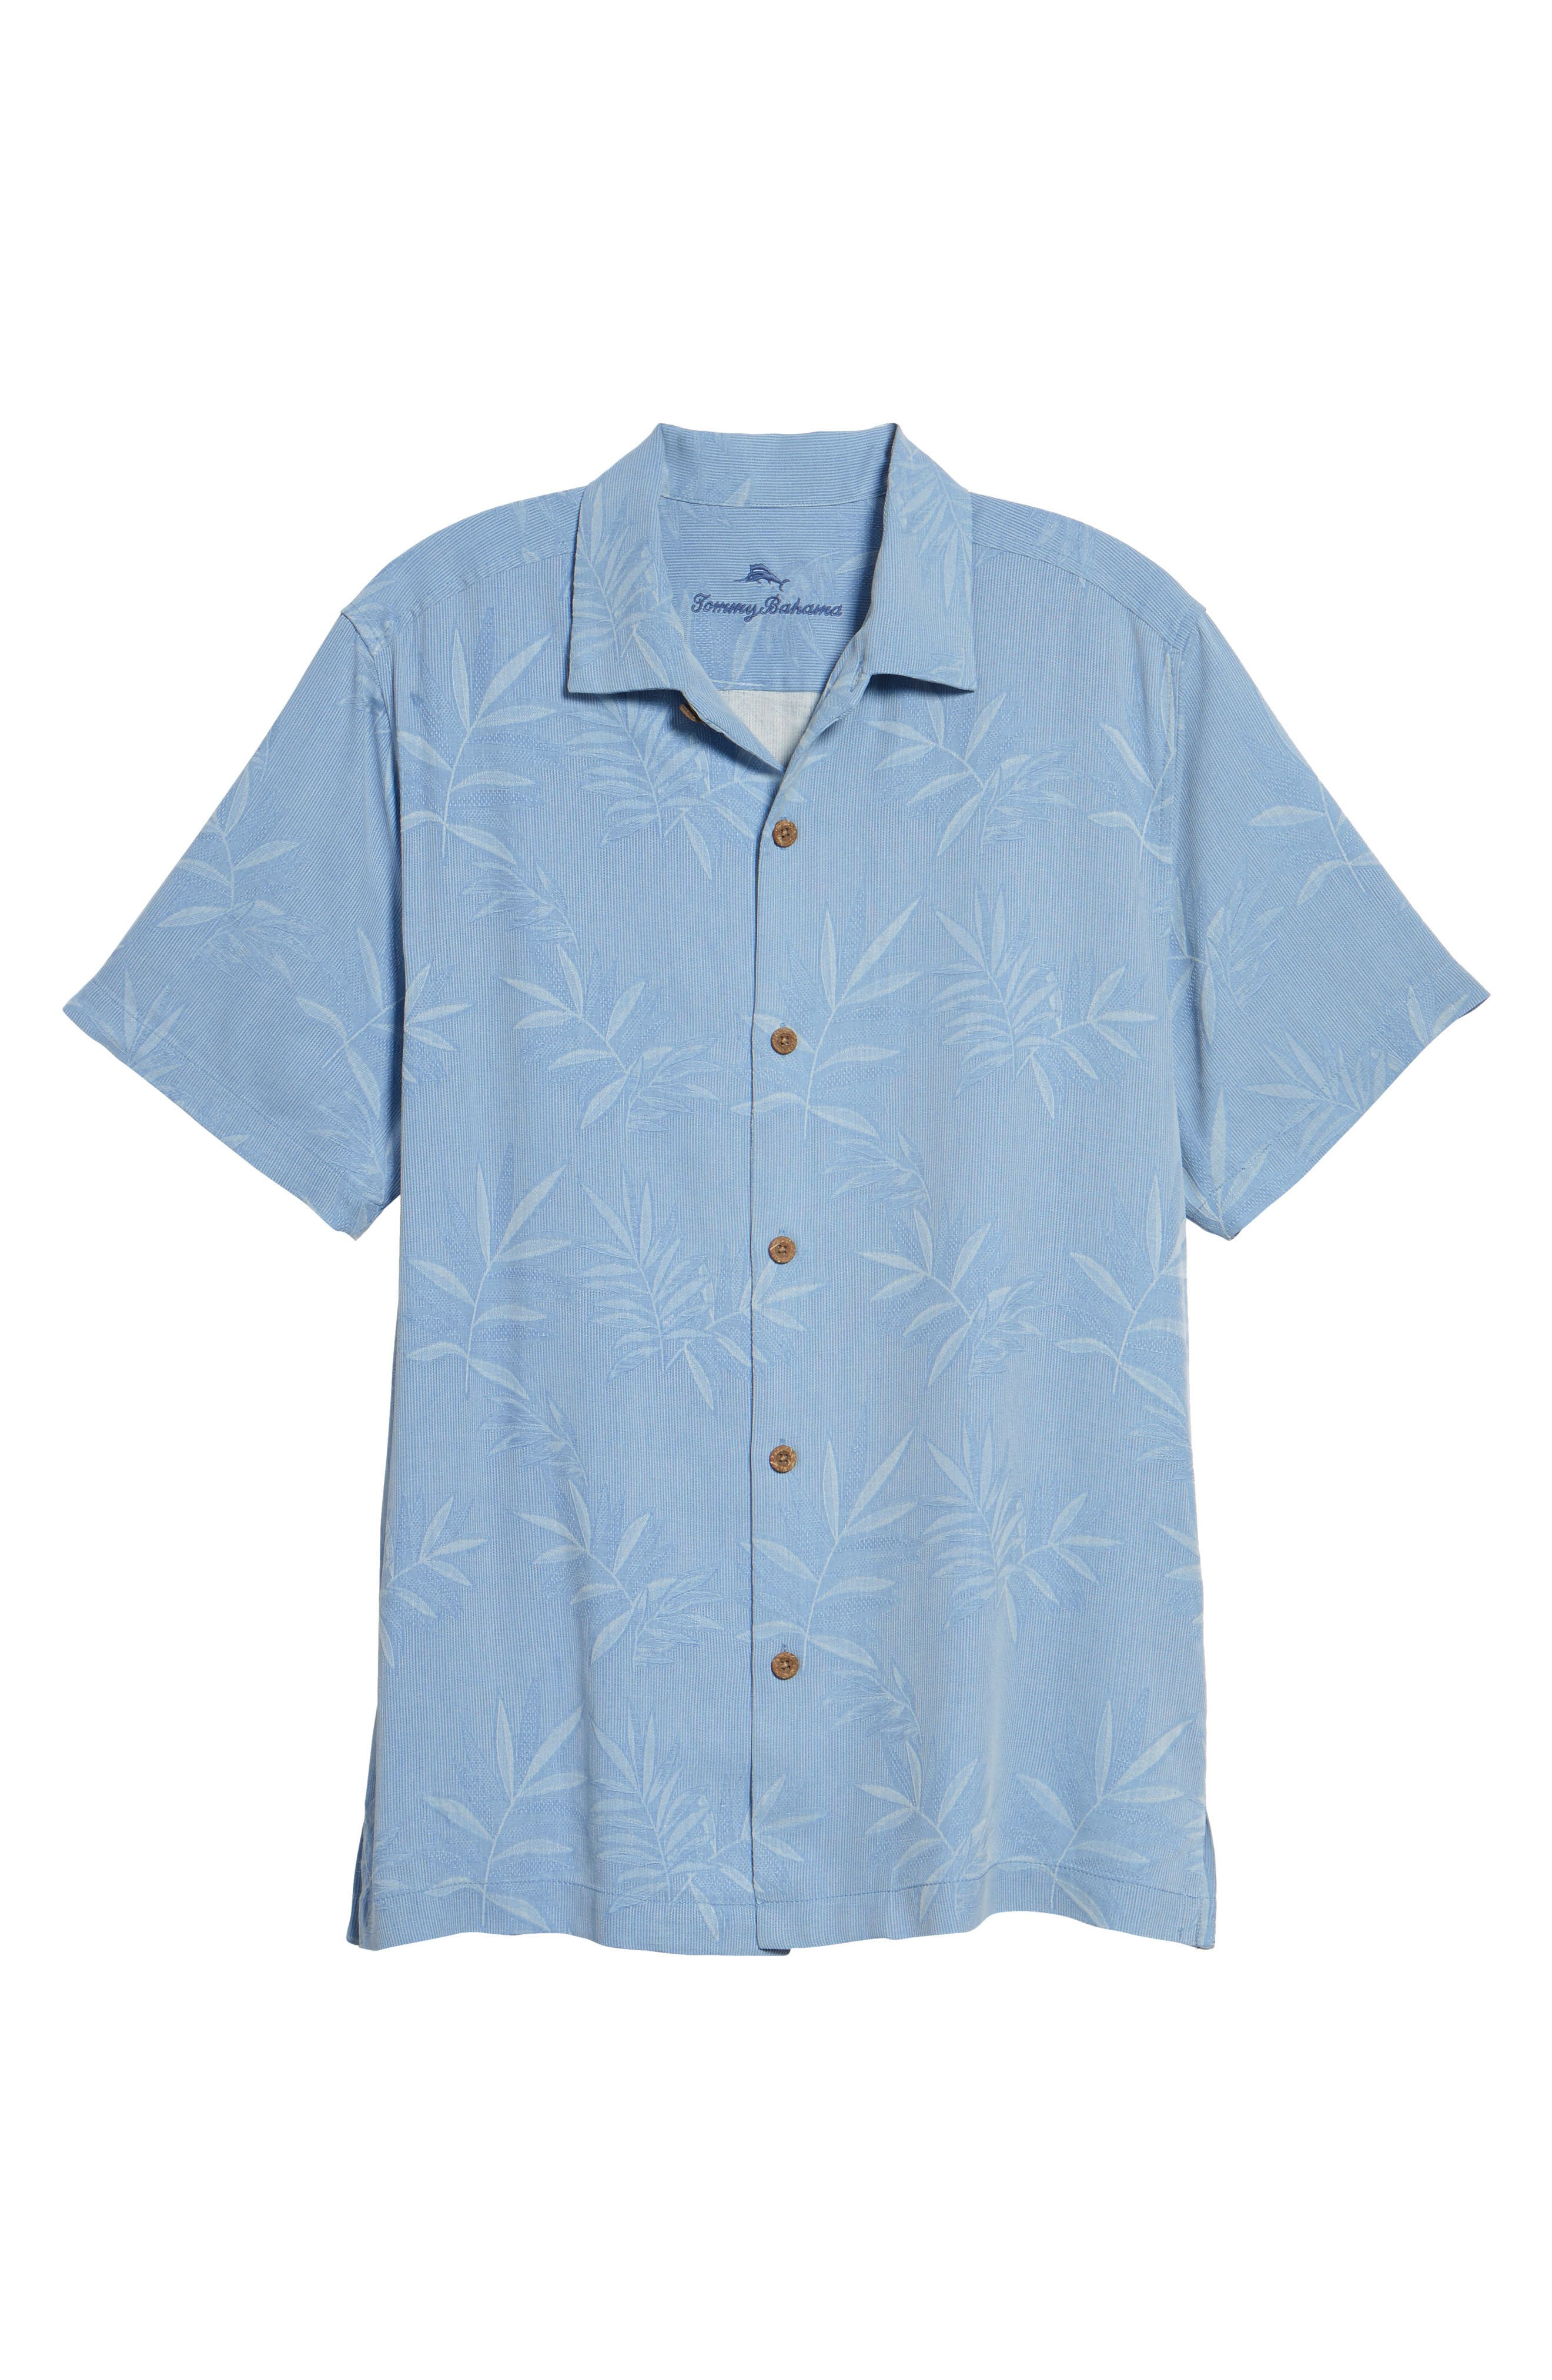 Luau Floral Silk Shirt,                             Alternate thumbnail 6, color,                             LIGHT SKY